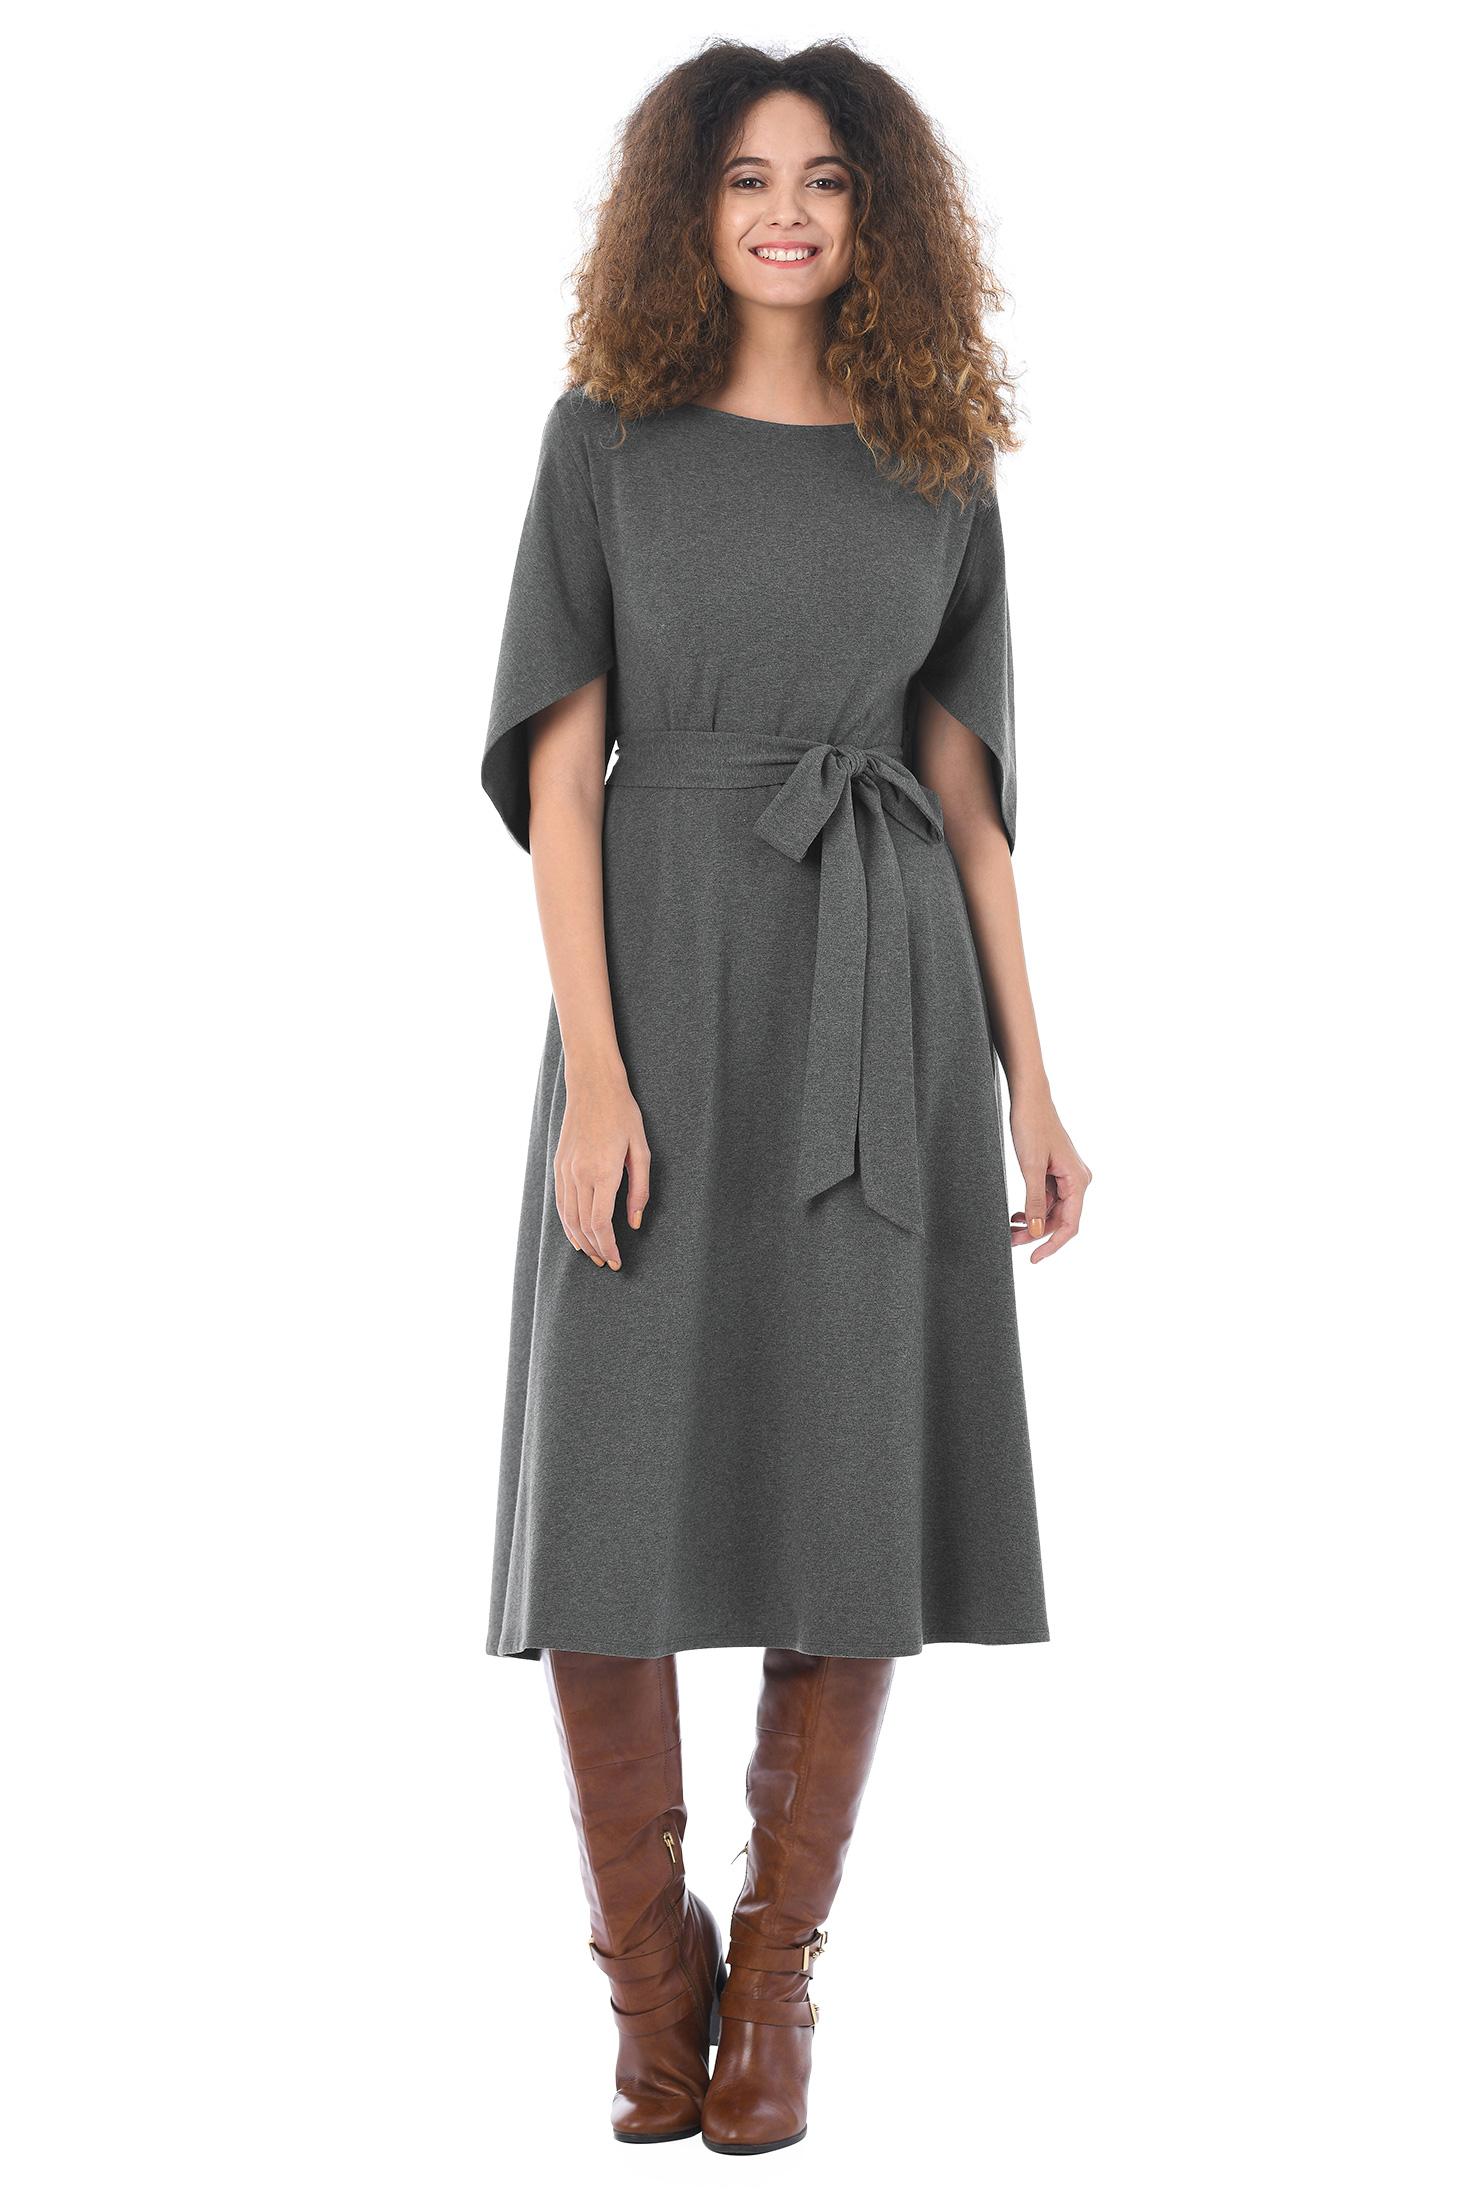 Eshakti Womens Cape Sleeve Cotton Knit Dress